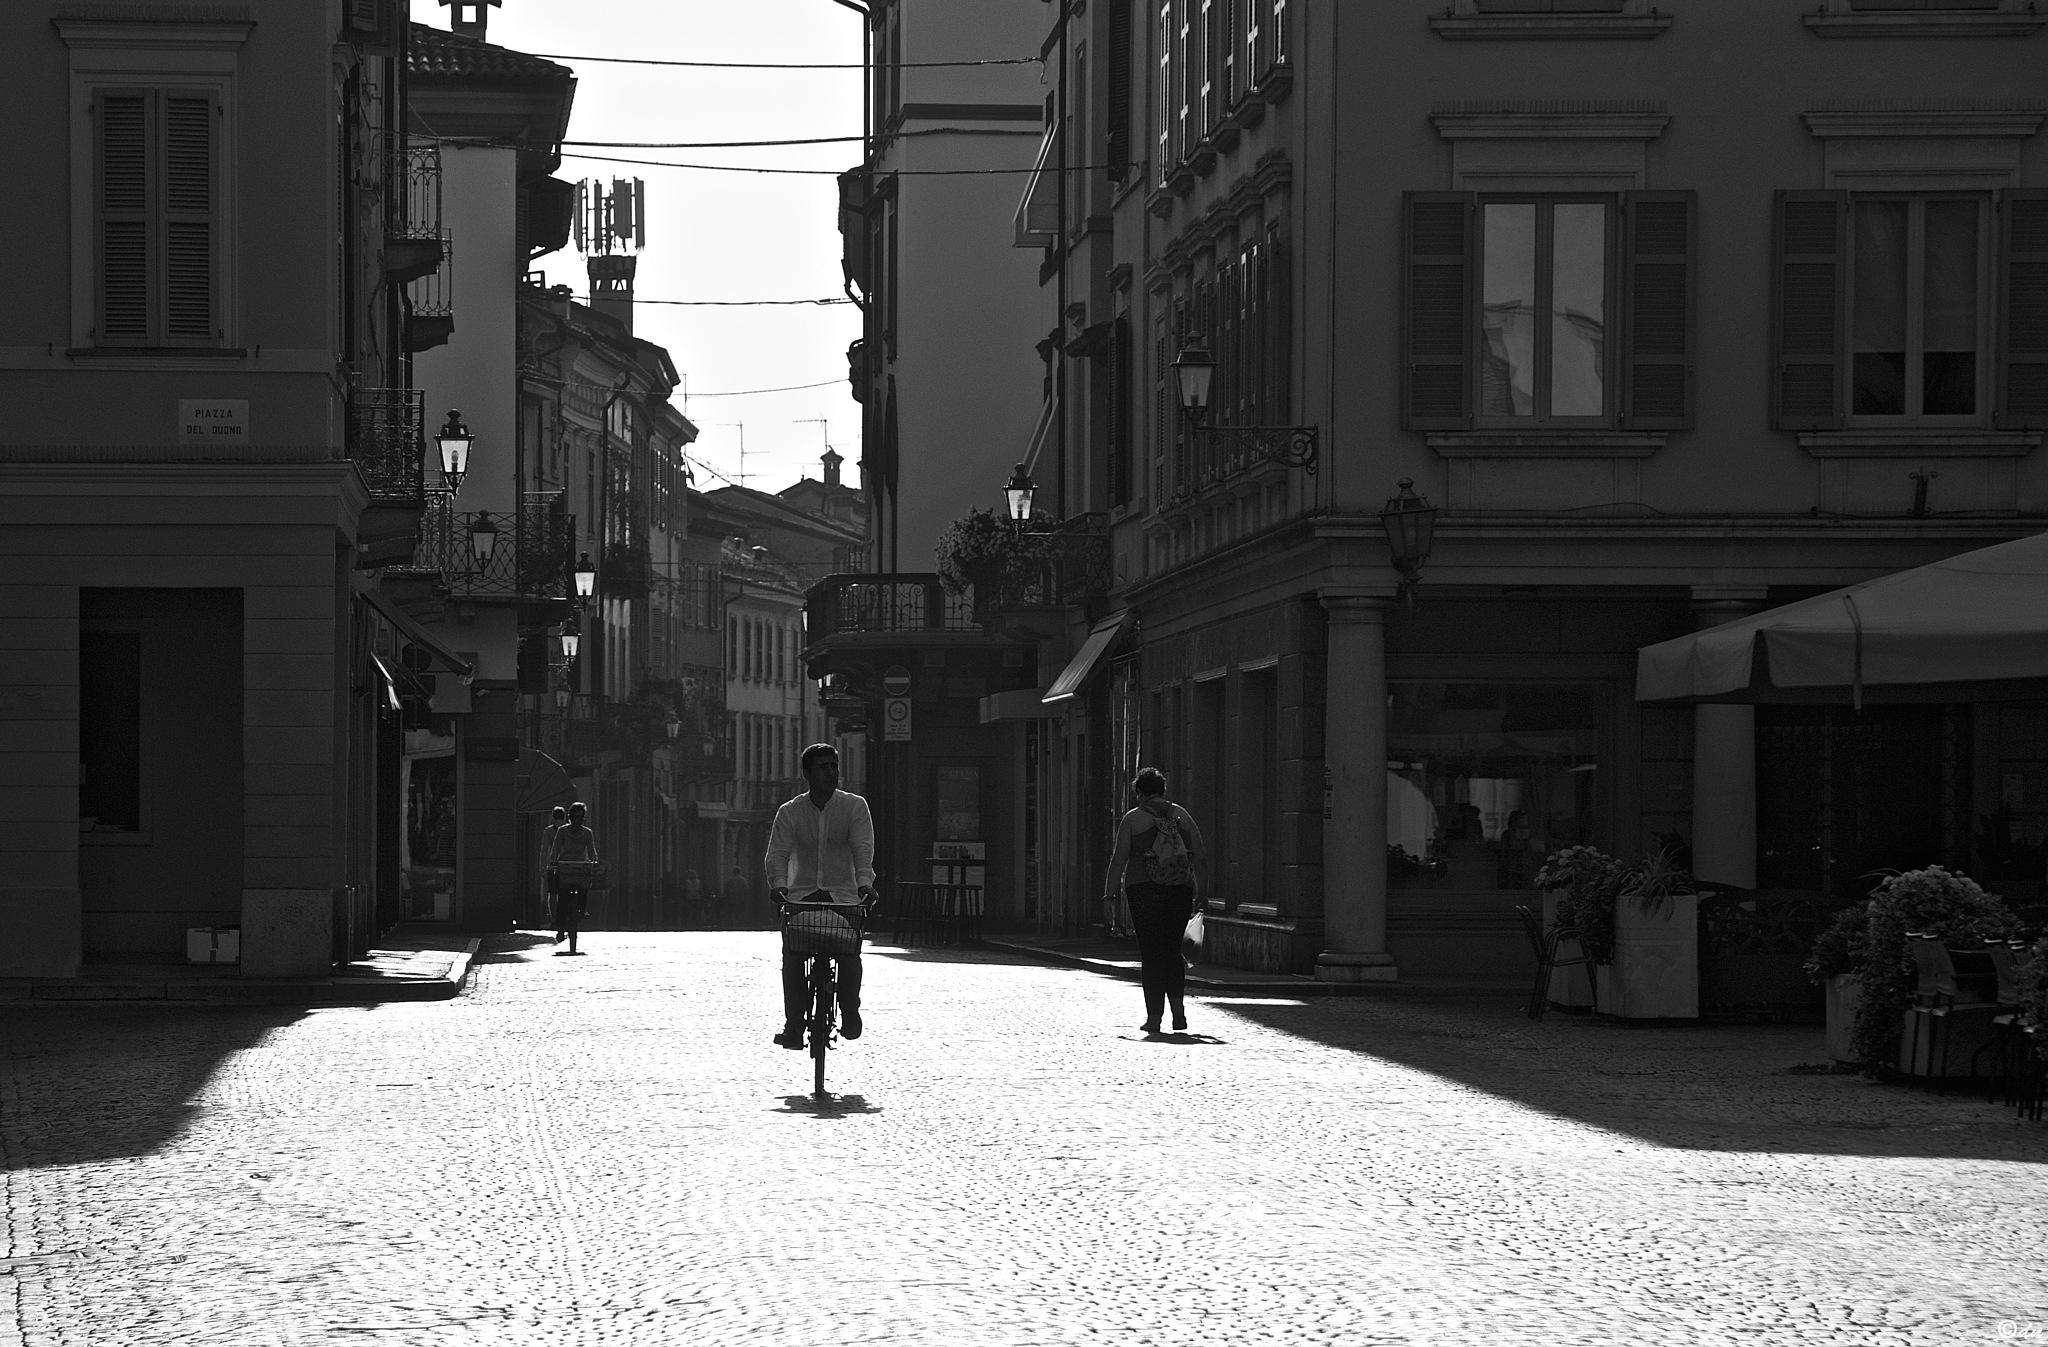 bici 2 bn by DavideNegro